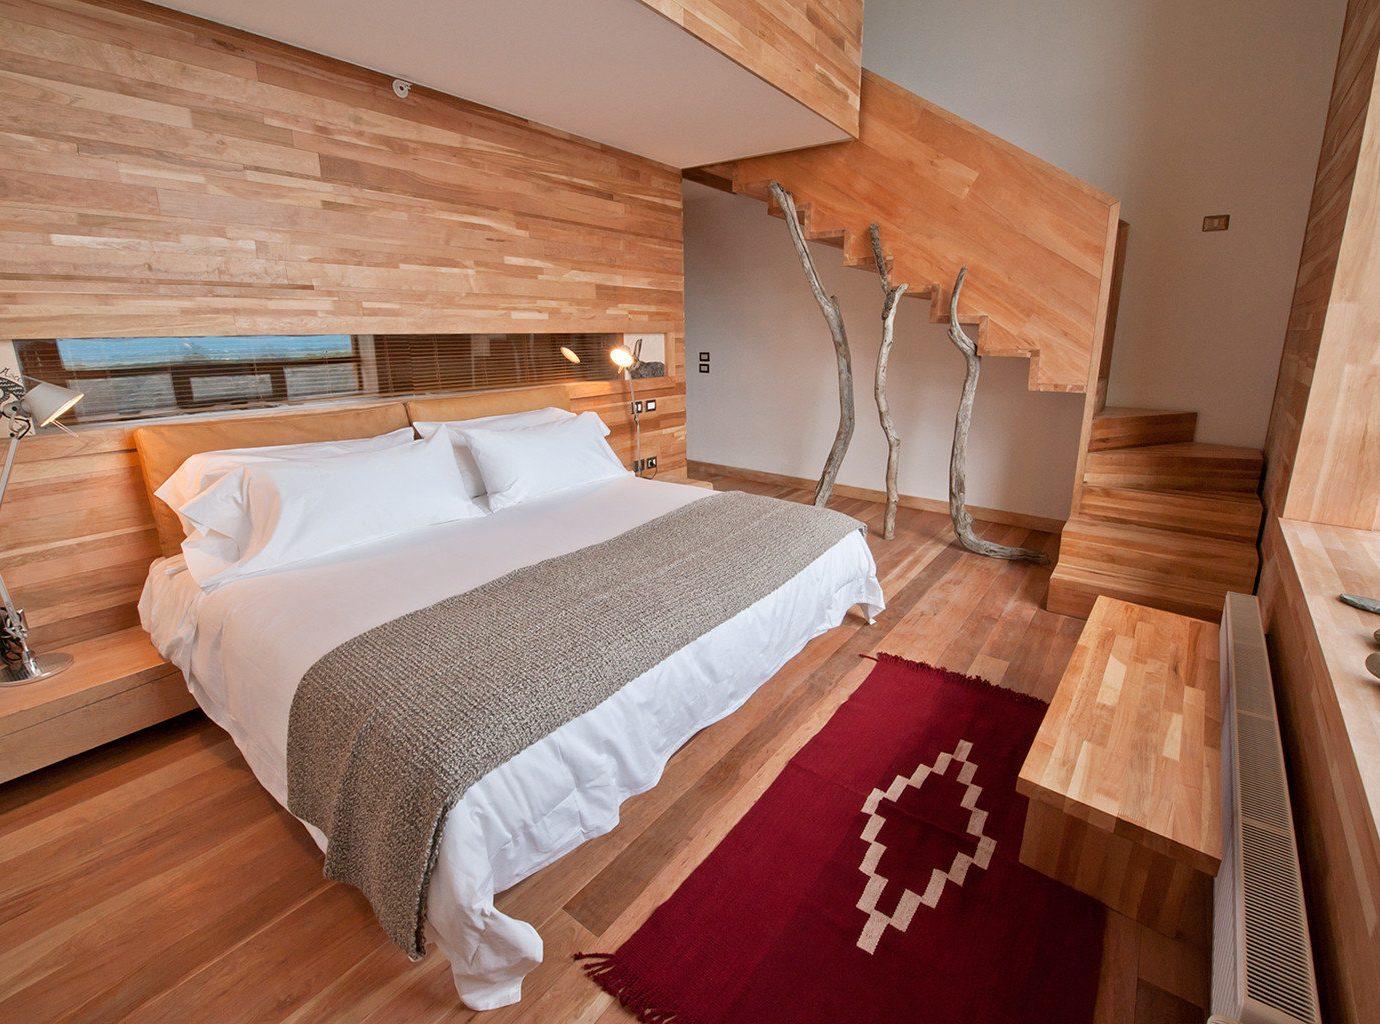 All-Inclusive Resorts Bedroom Elegant Hip Hotels Luxury Modern Romantic Hotels Suite indoor bed floor wall room property cottage hardwood wooden real estate estate apartment wood